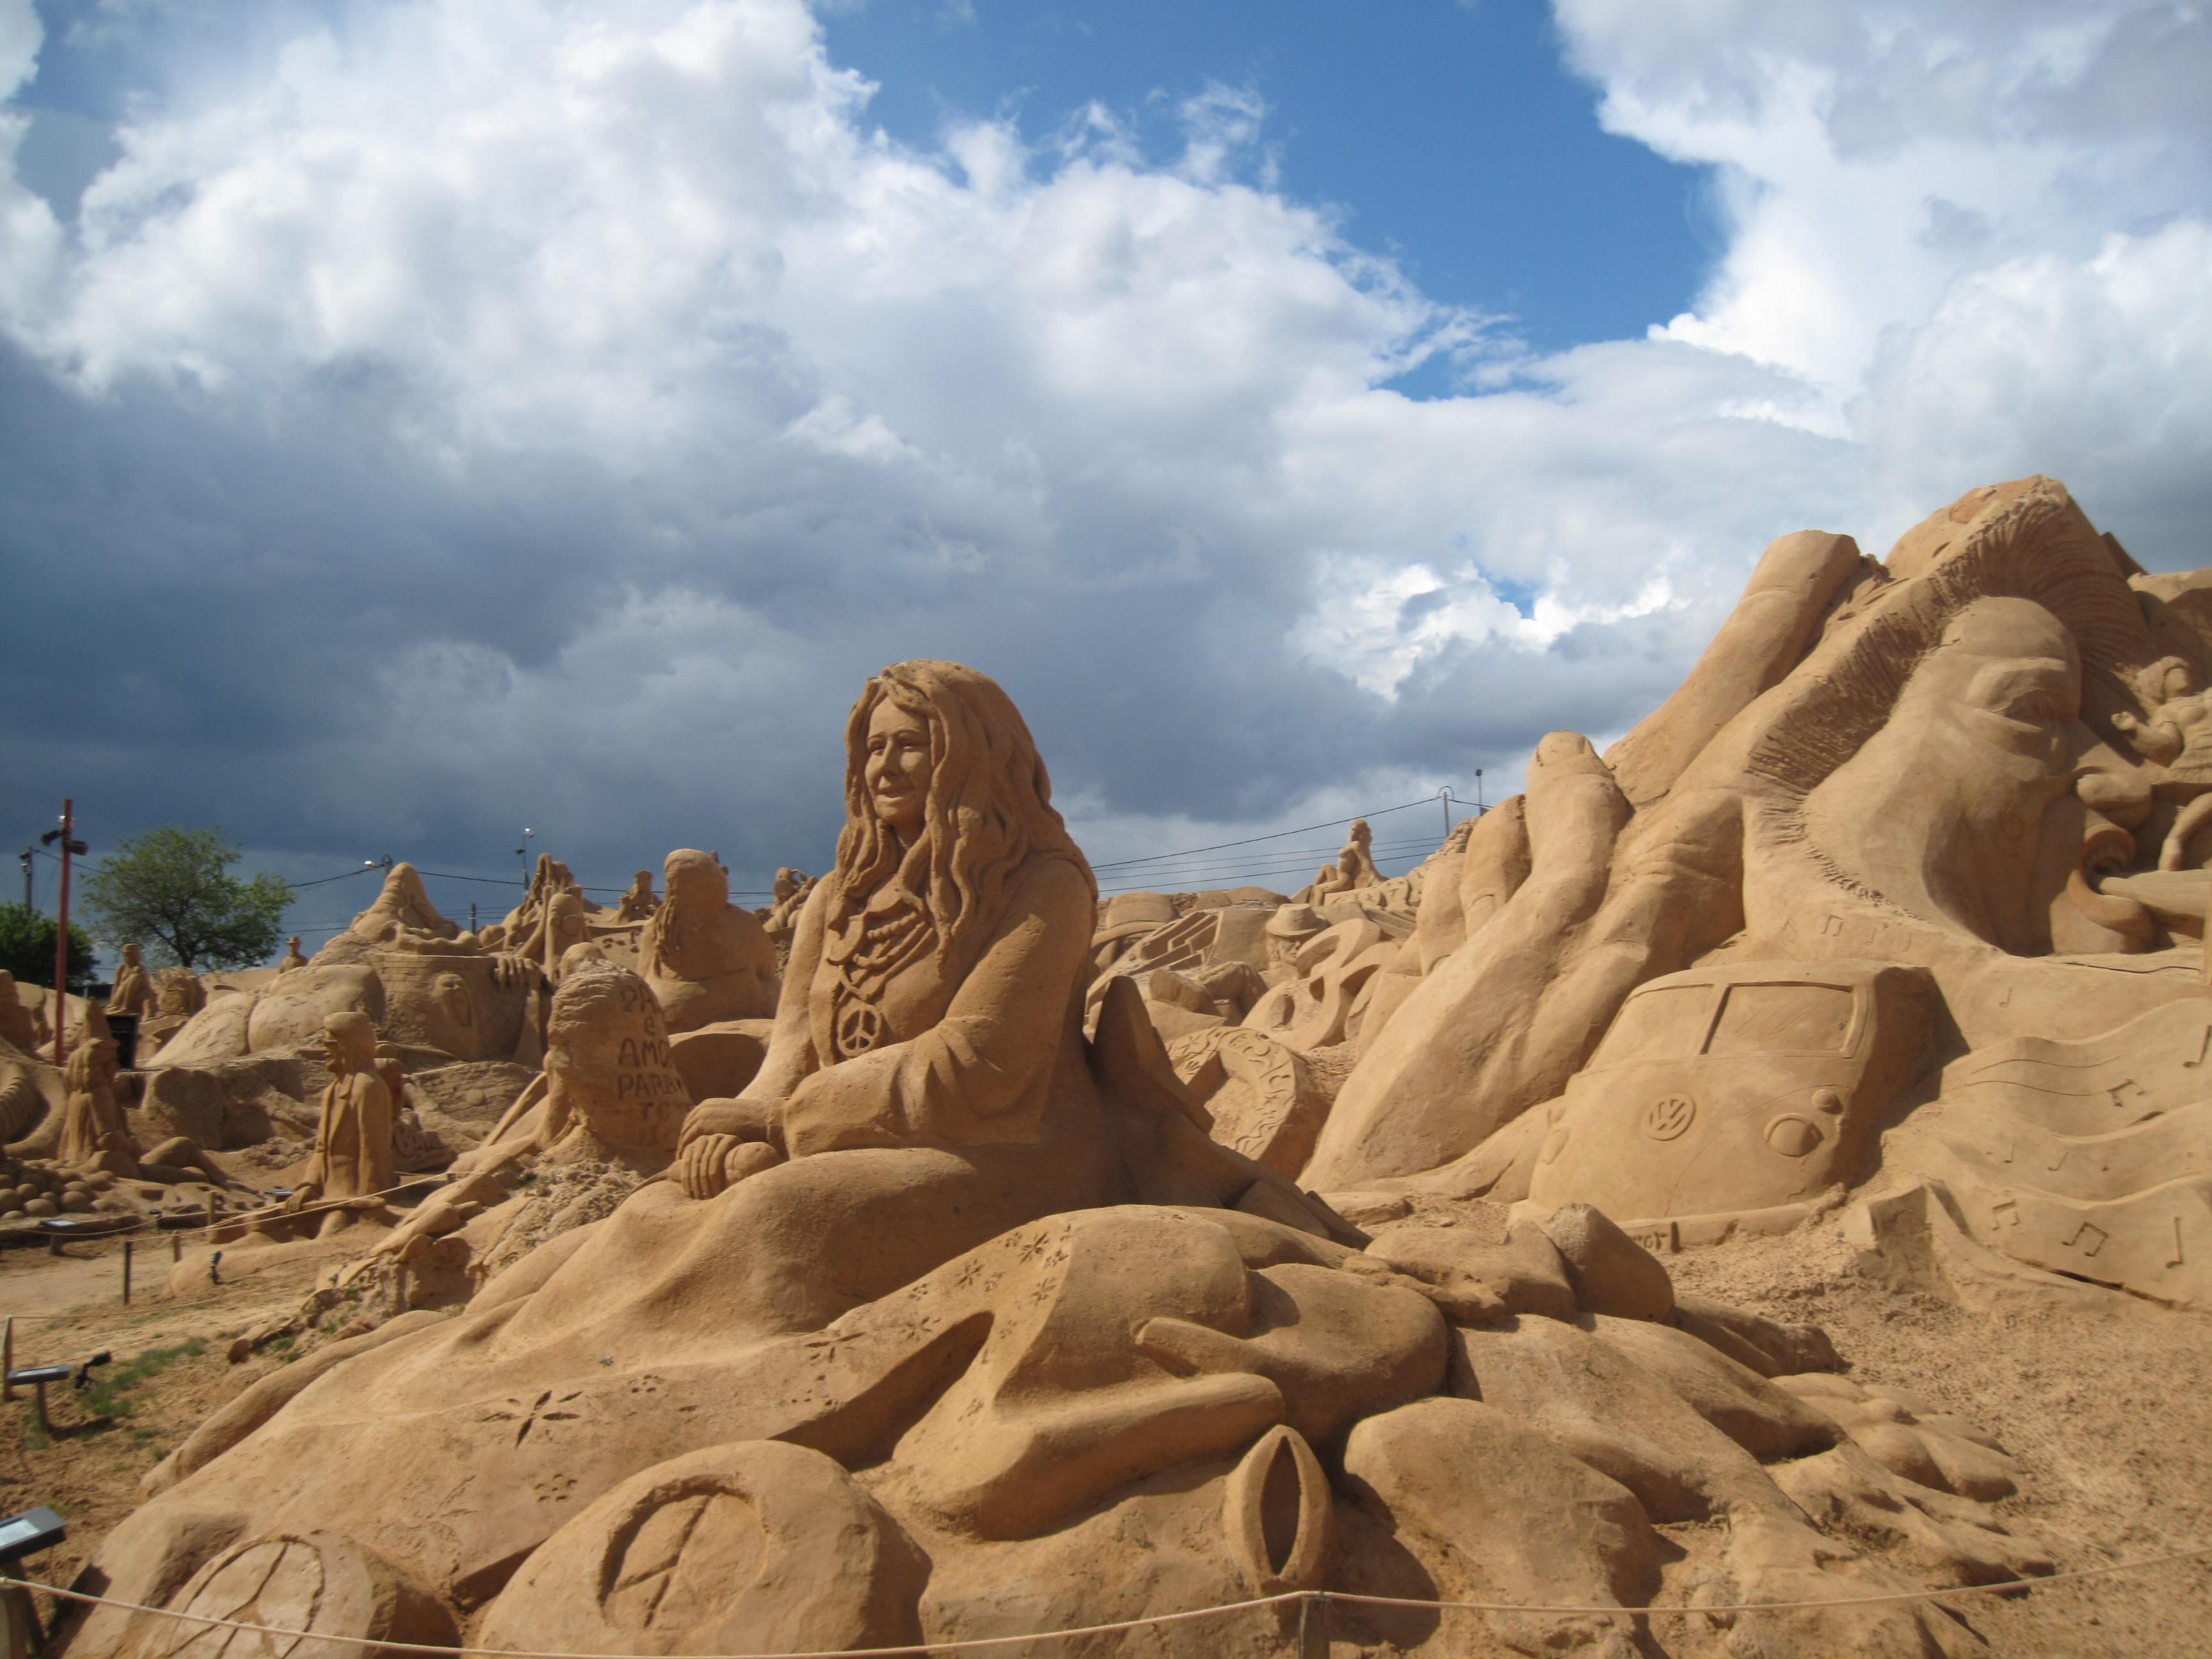 Sand city 045